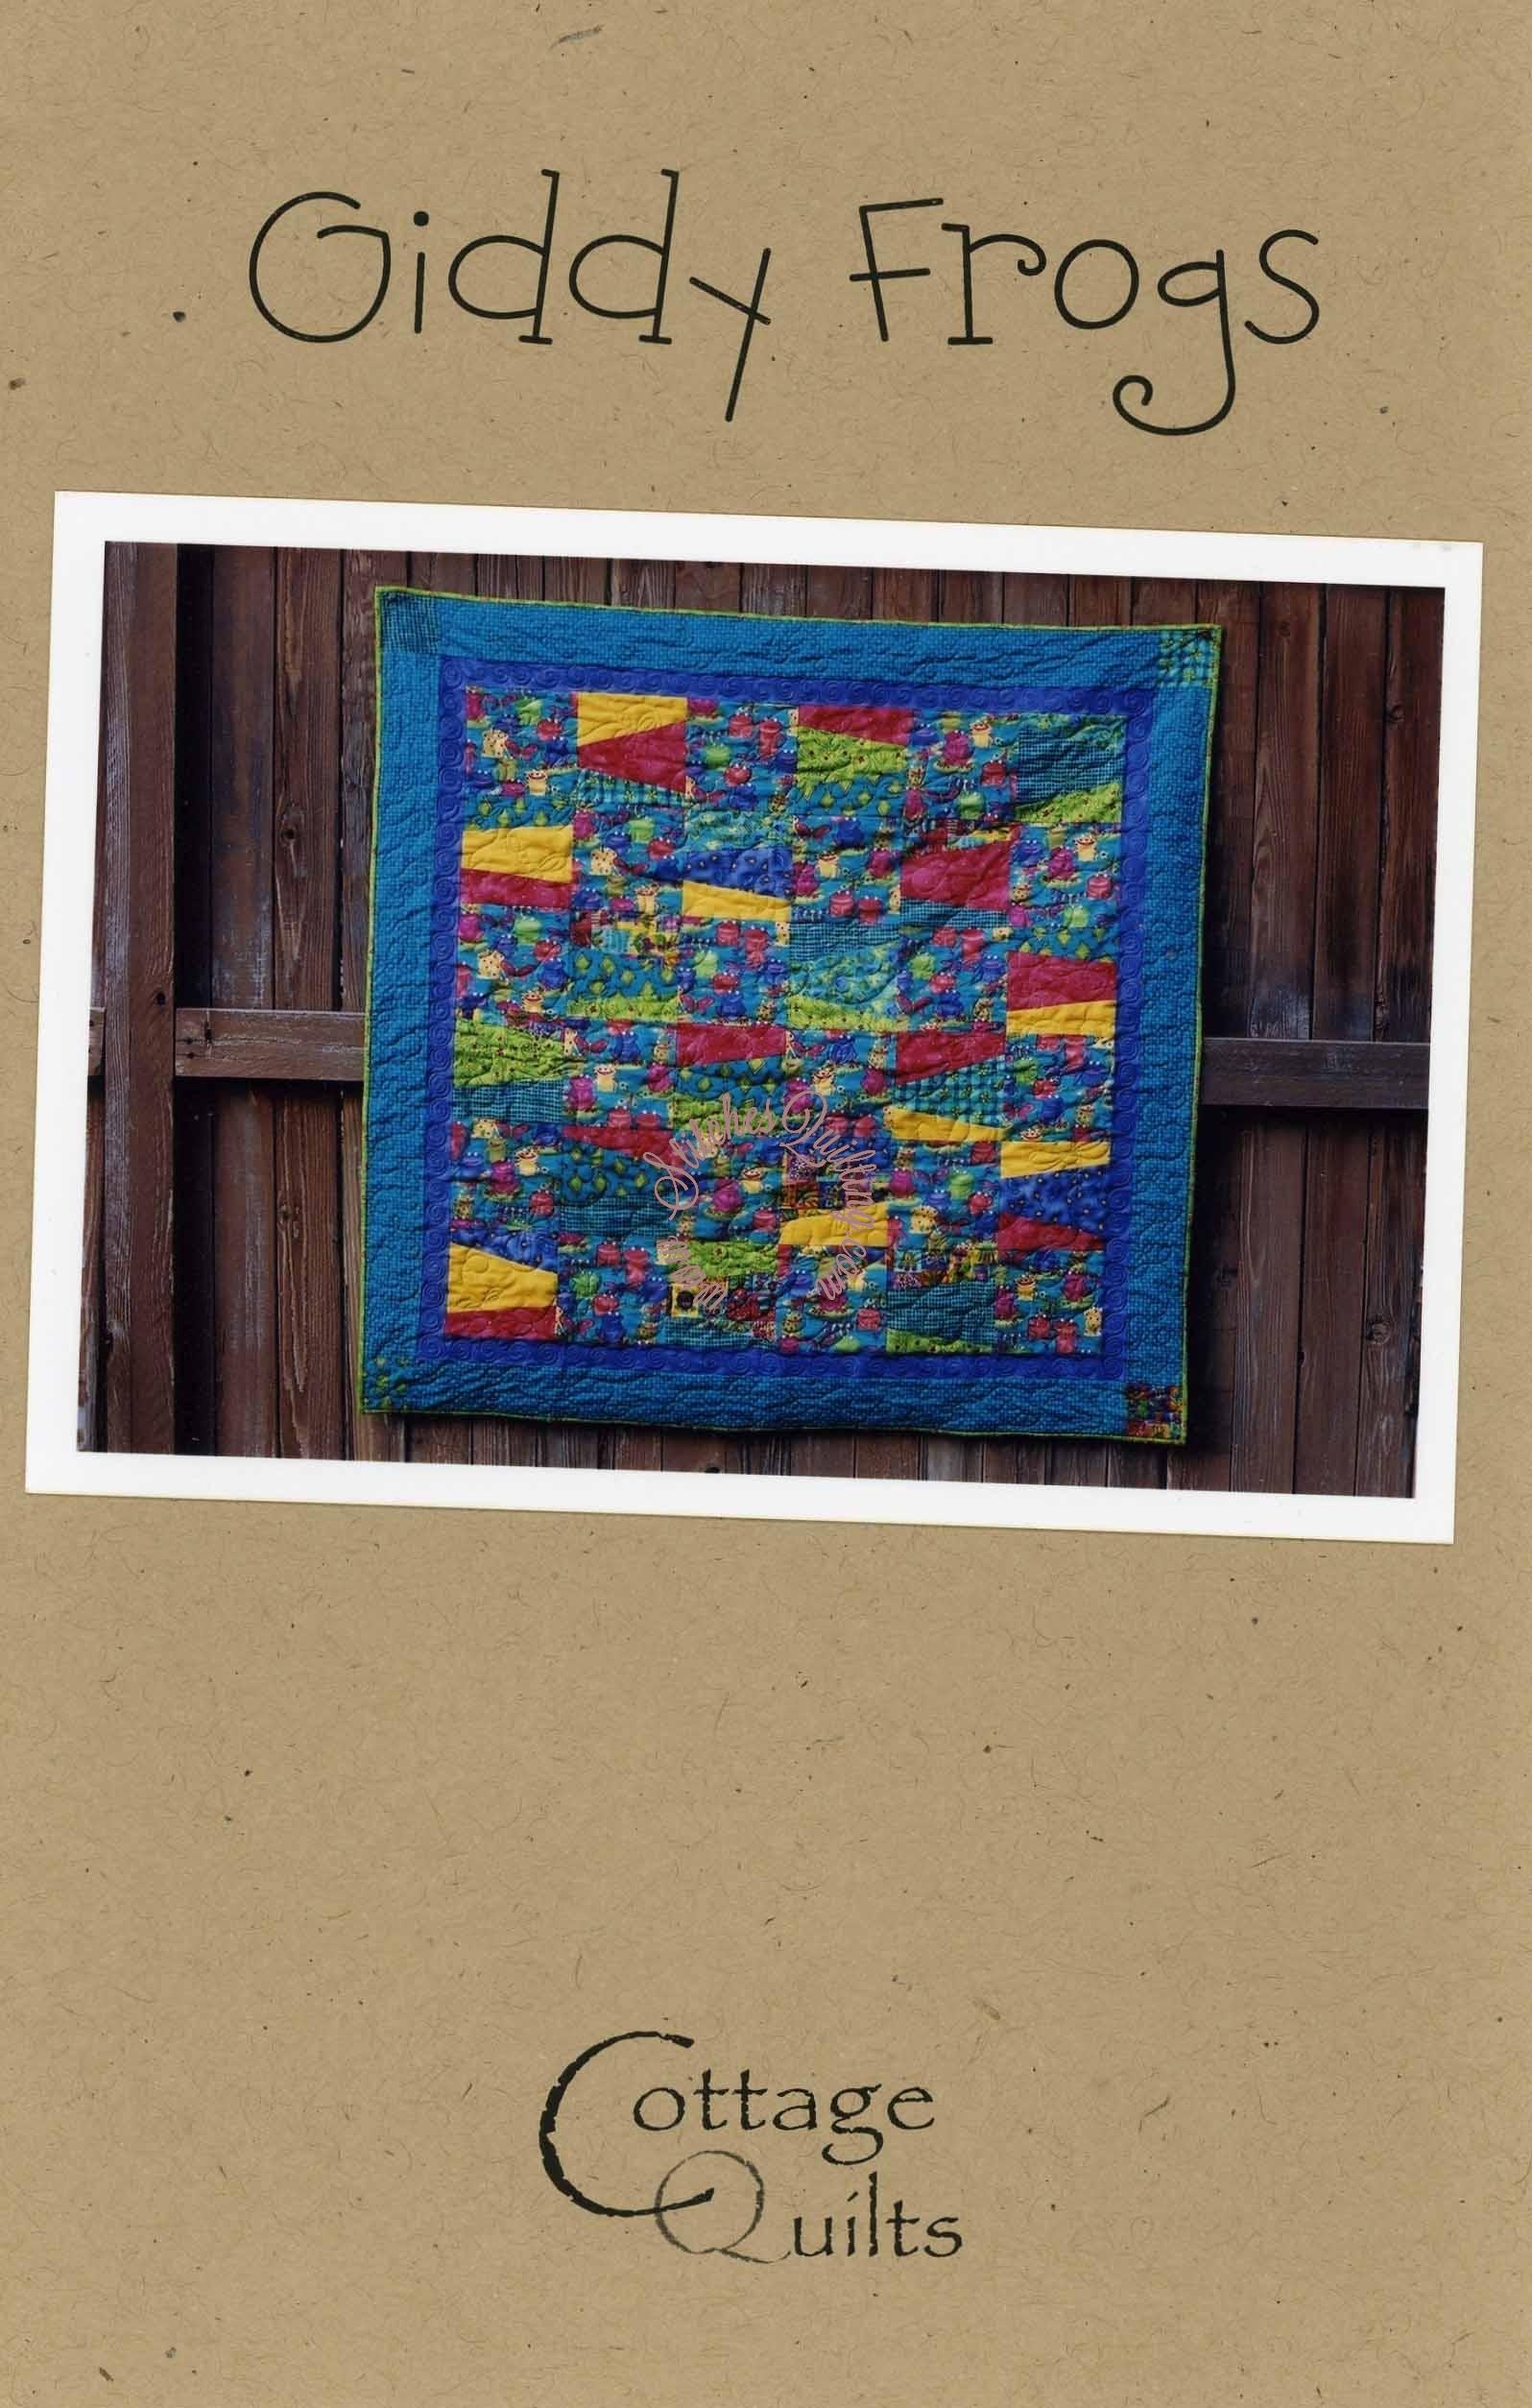 quilts osage quilter september for cottages sale bluff cottage